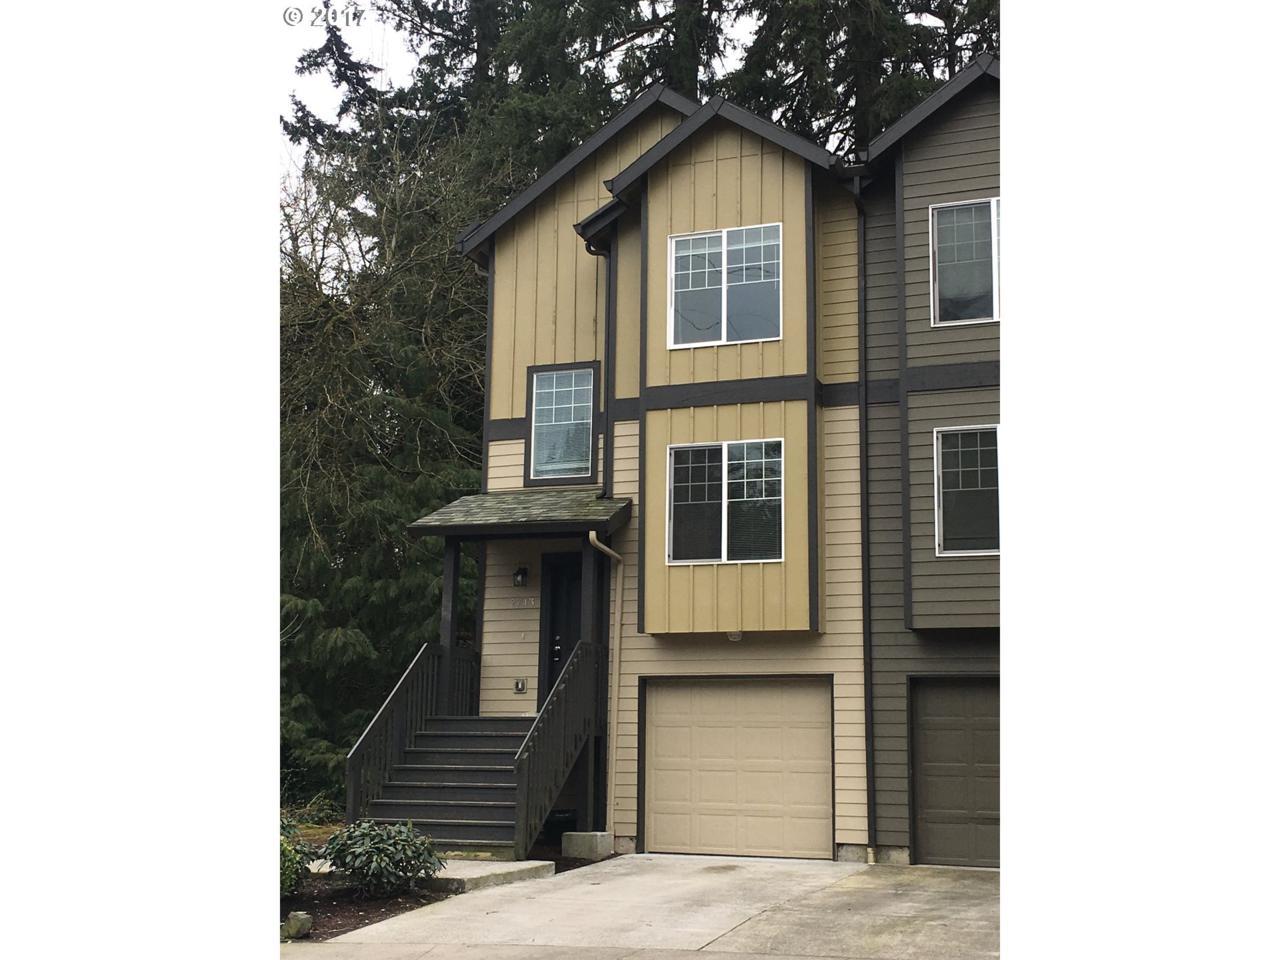 2743 Rossiter Ln, Vancouver, WA 98661 (MLS #17331054) :: Cano Real Estate